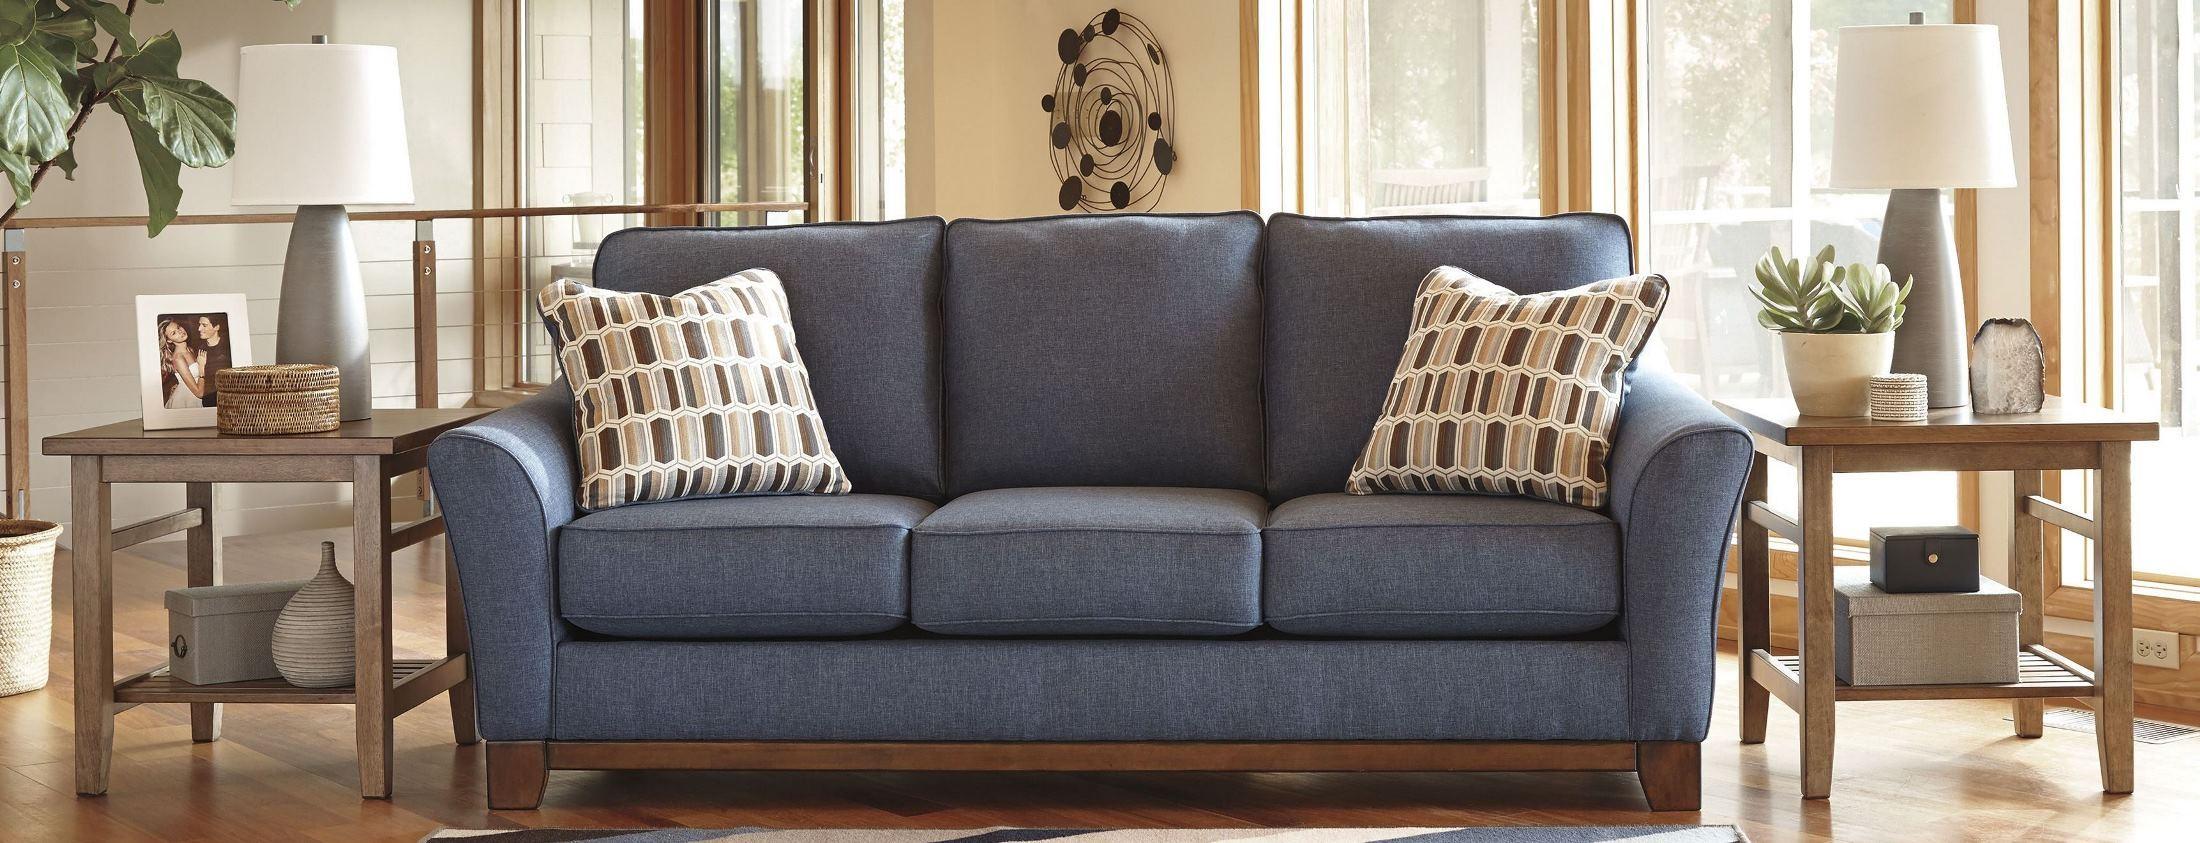 Janley Denim Sofa 4380738 Janley Denim Living Room Set